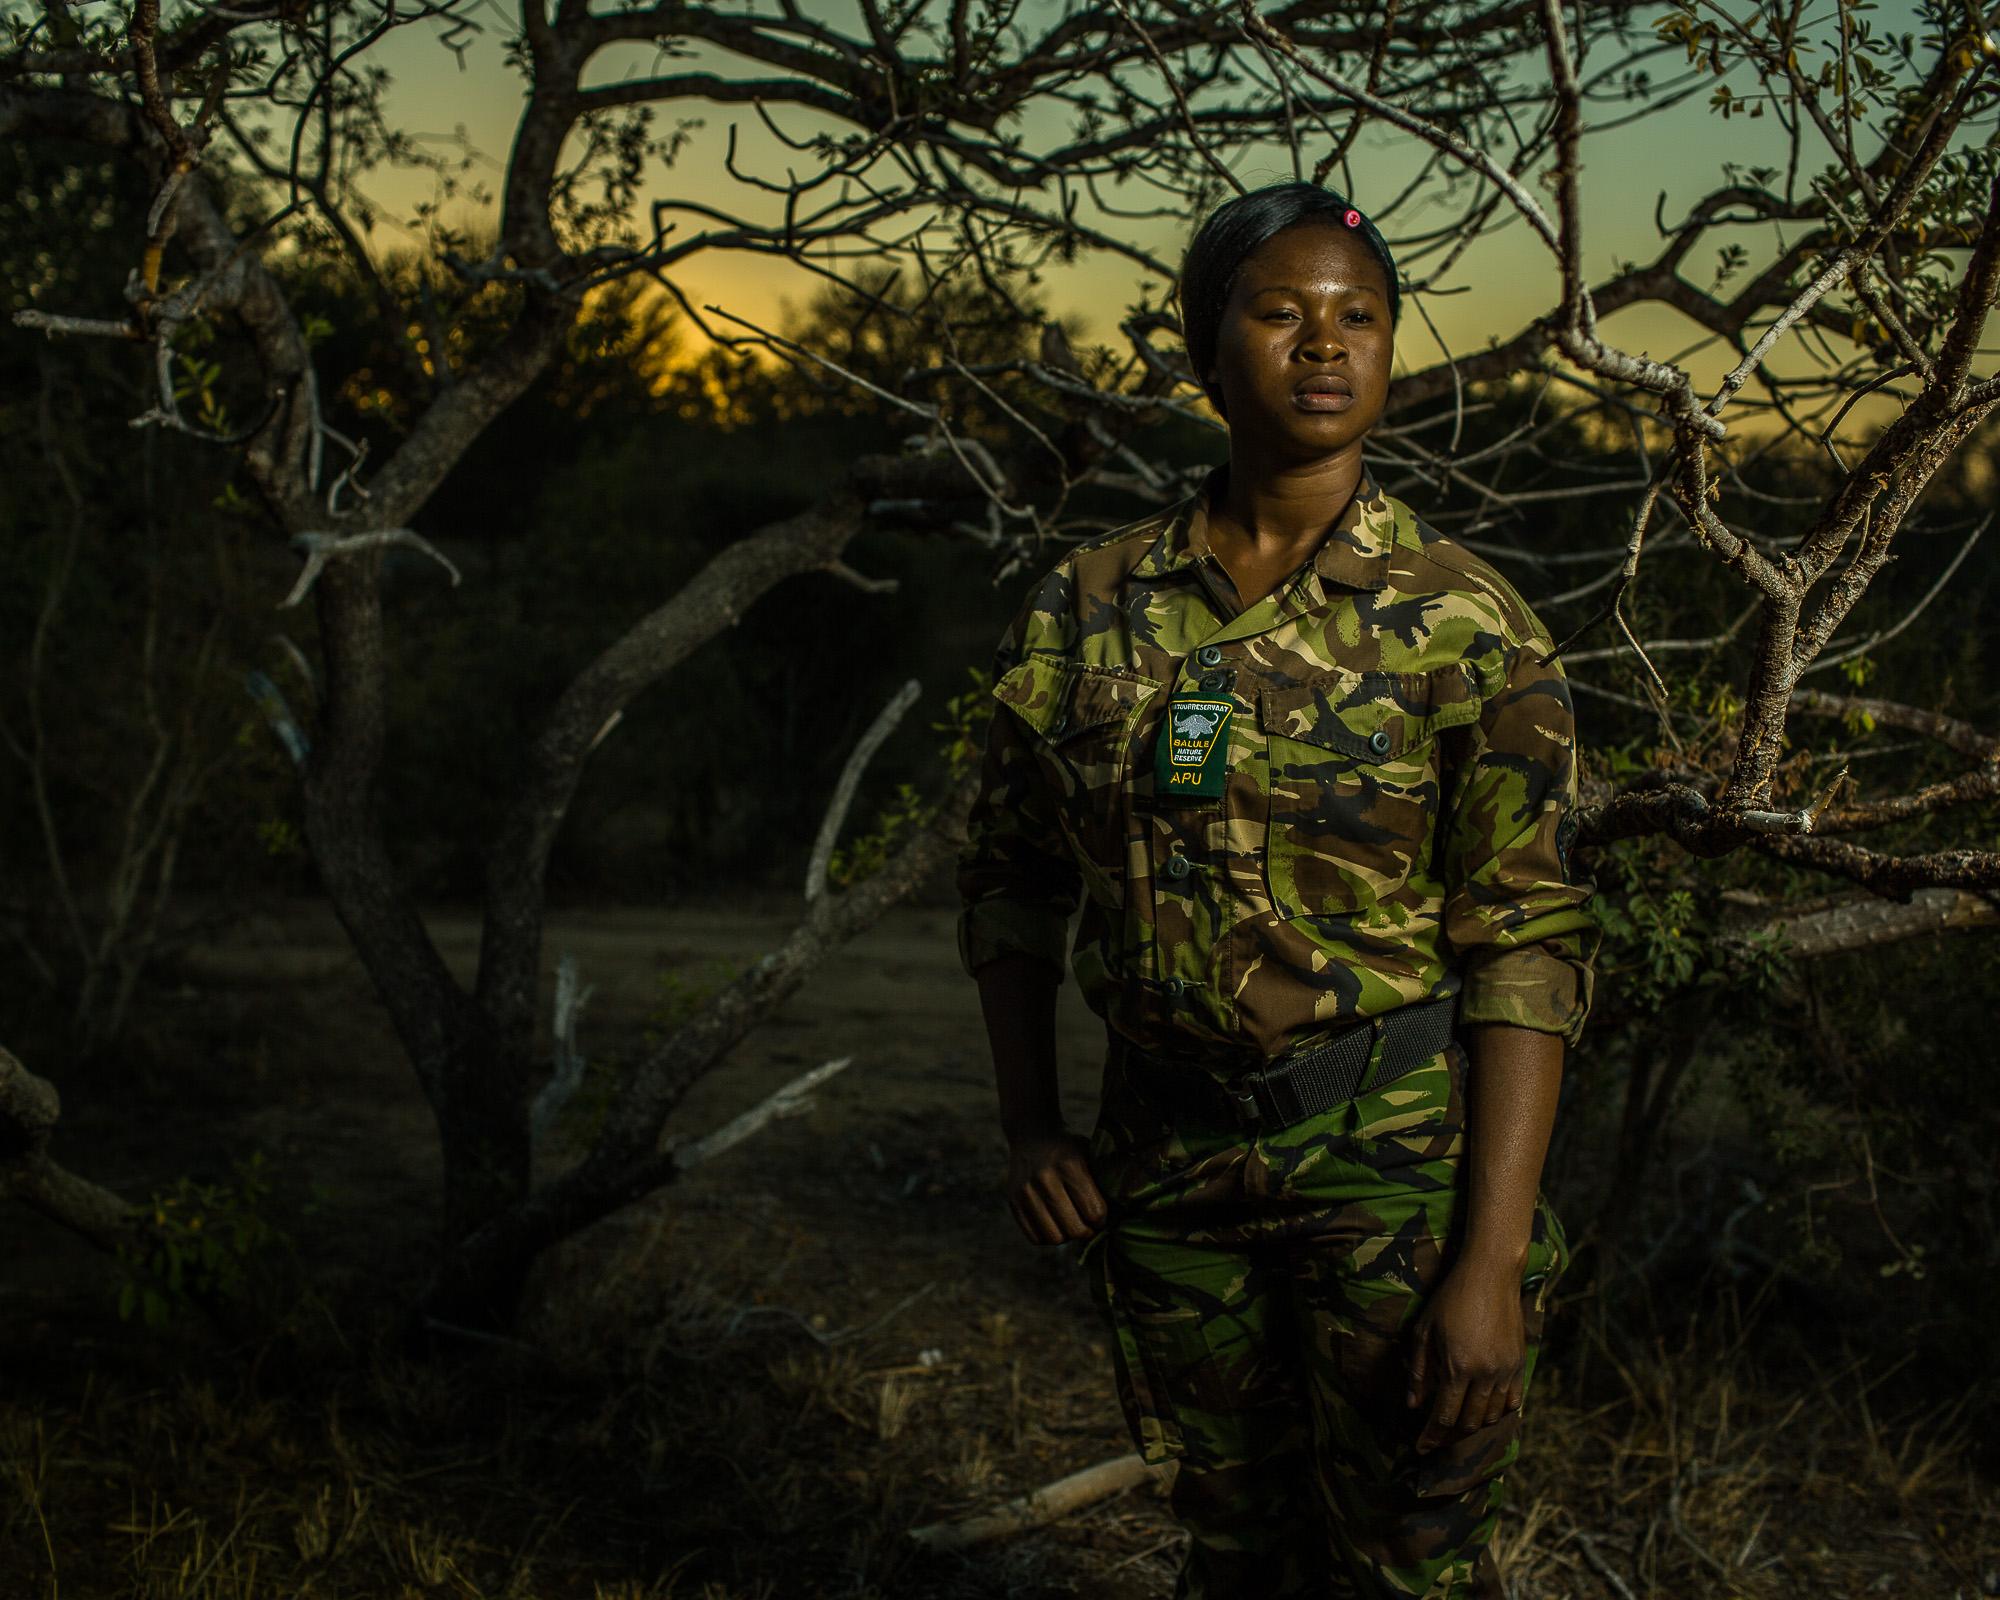 Leitah Mkhabela, a member of the Black Mamba anti-poaching unit in Balule Game Reserve.